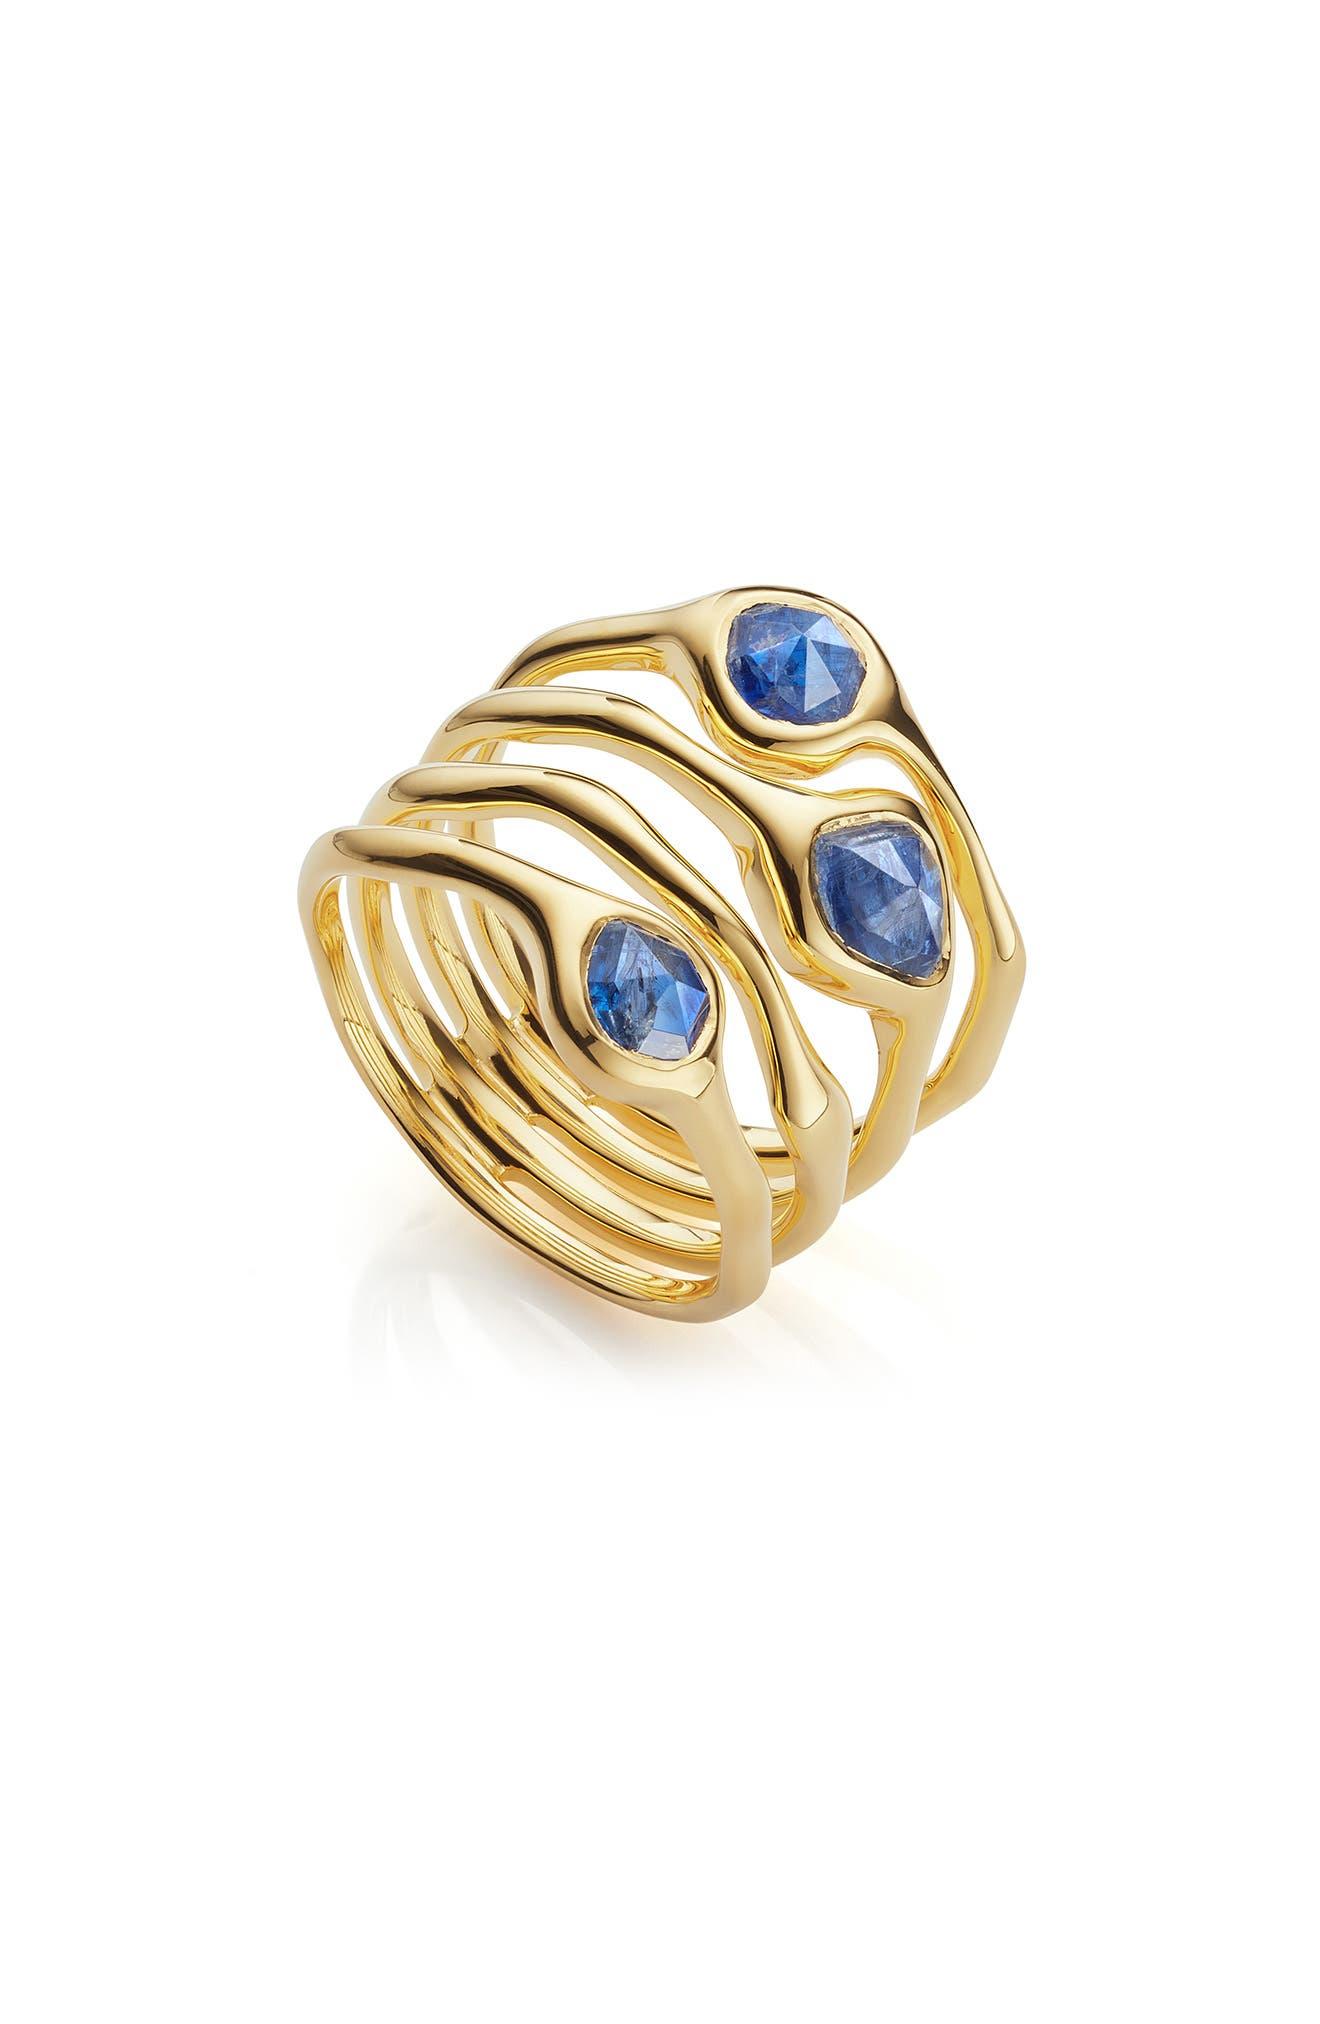 Siren Cluster Cocktail Ring,                             Main thumbnail 1, color,                             GOLD/ KYANITE